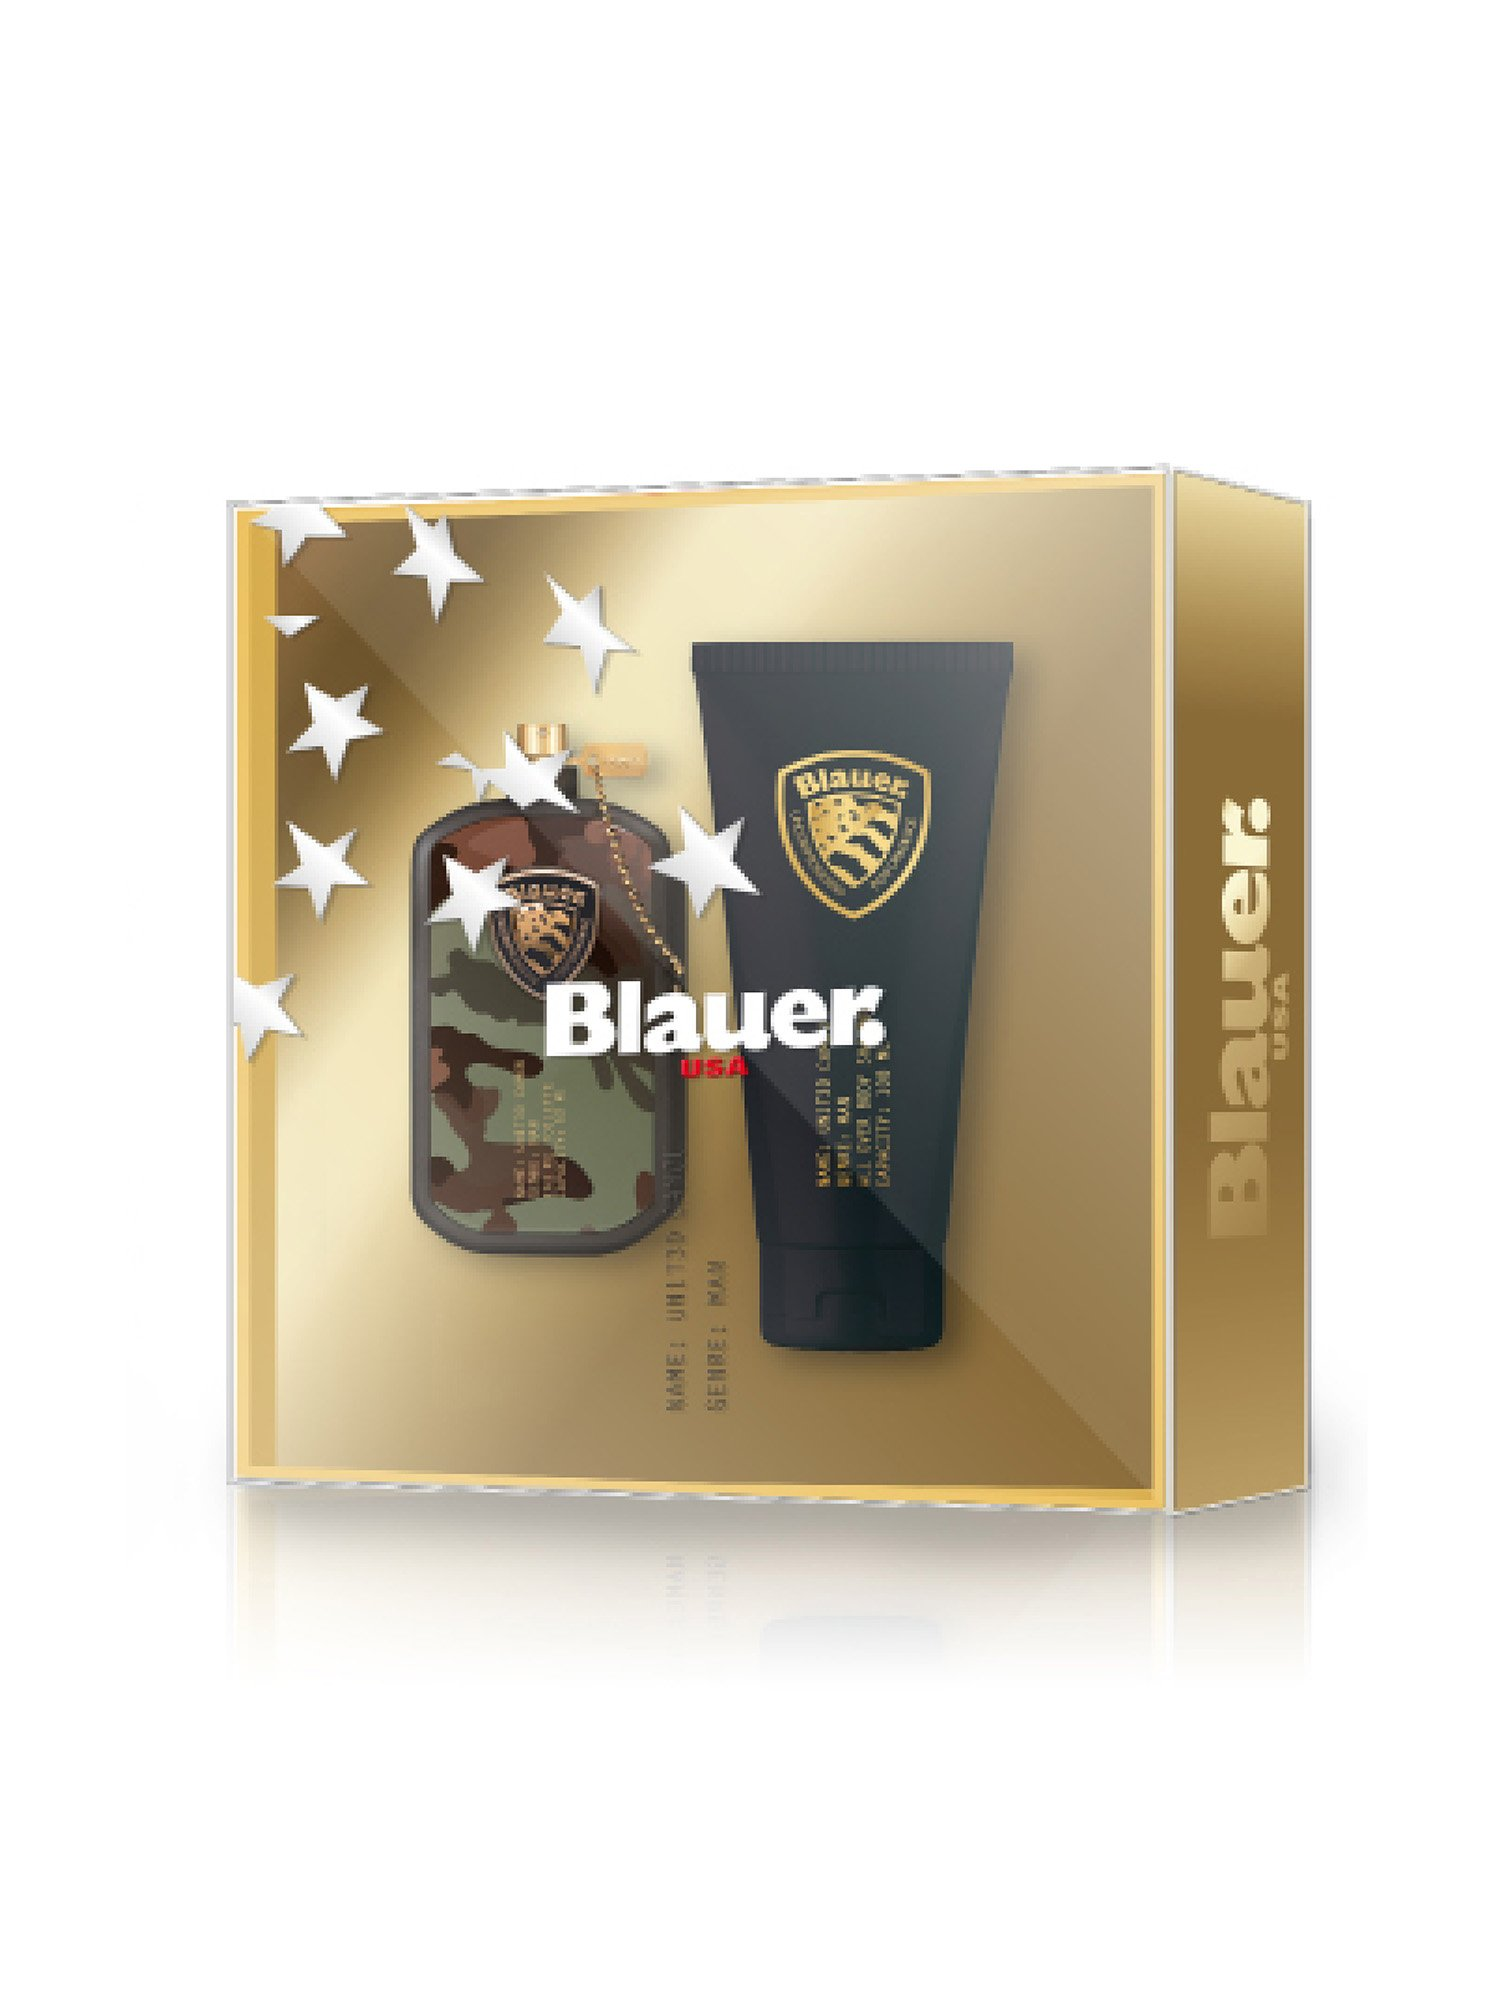 BLAUER CAMOU COFFRET FOR MAN - Blauer